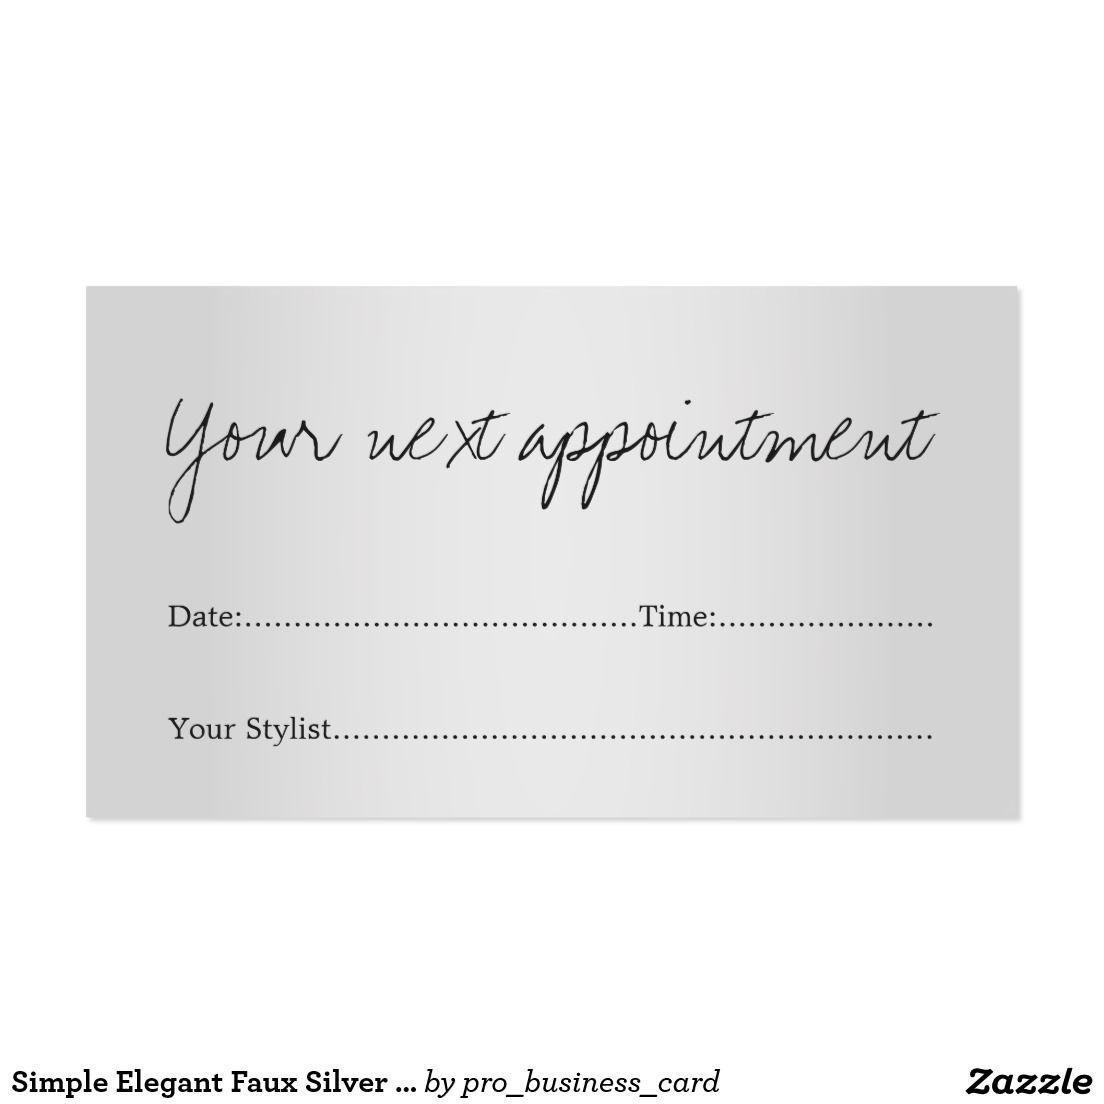 Simple Elegant Faux Silver Salon Appointment Card | Logo ideas ...